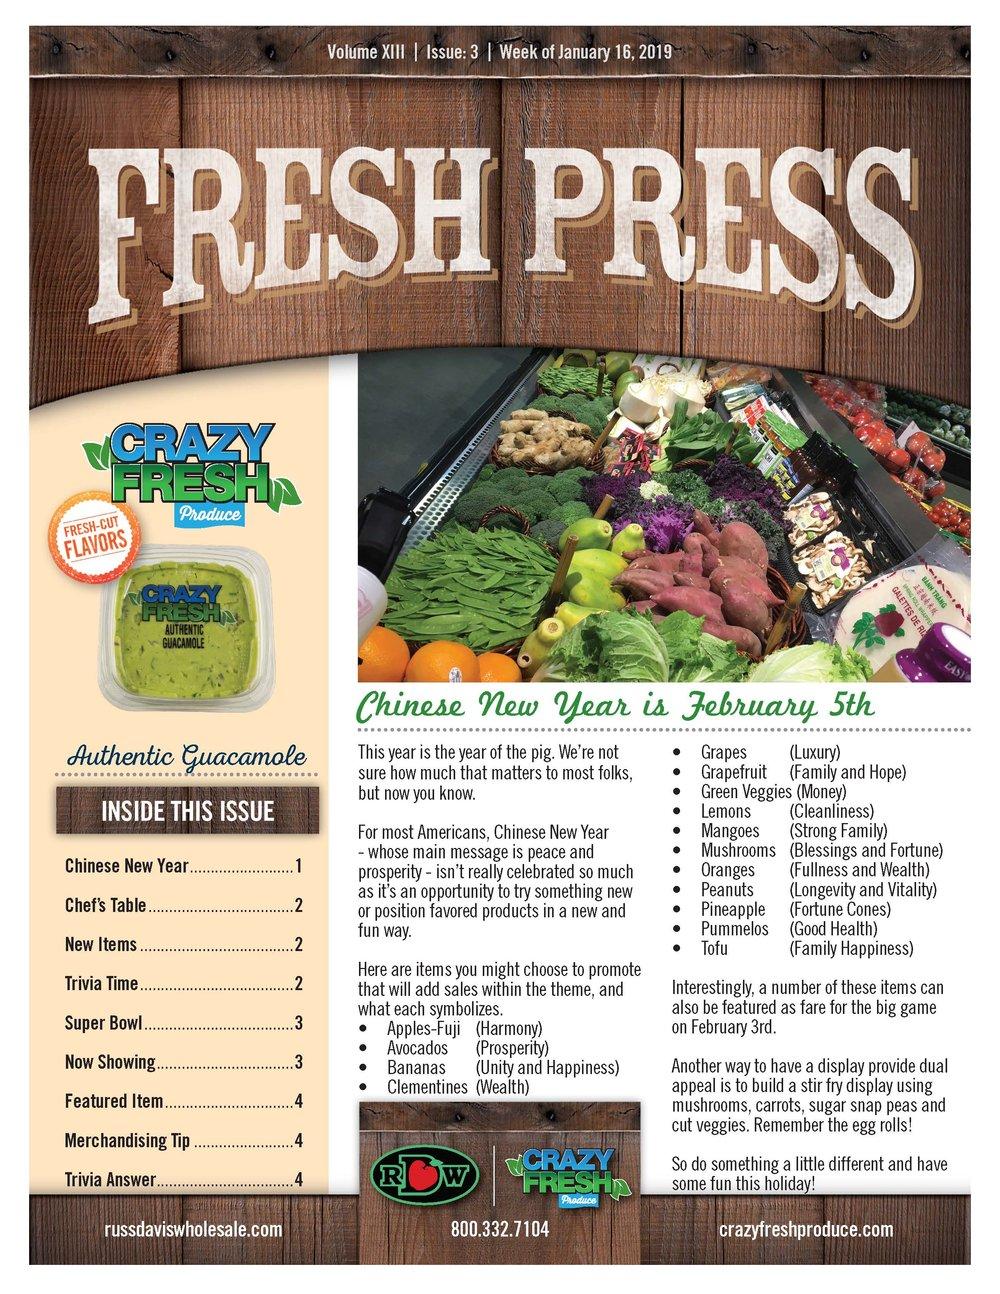 RDW_Fresh_Press_Jan16_2019_Page_1.jpg